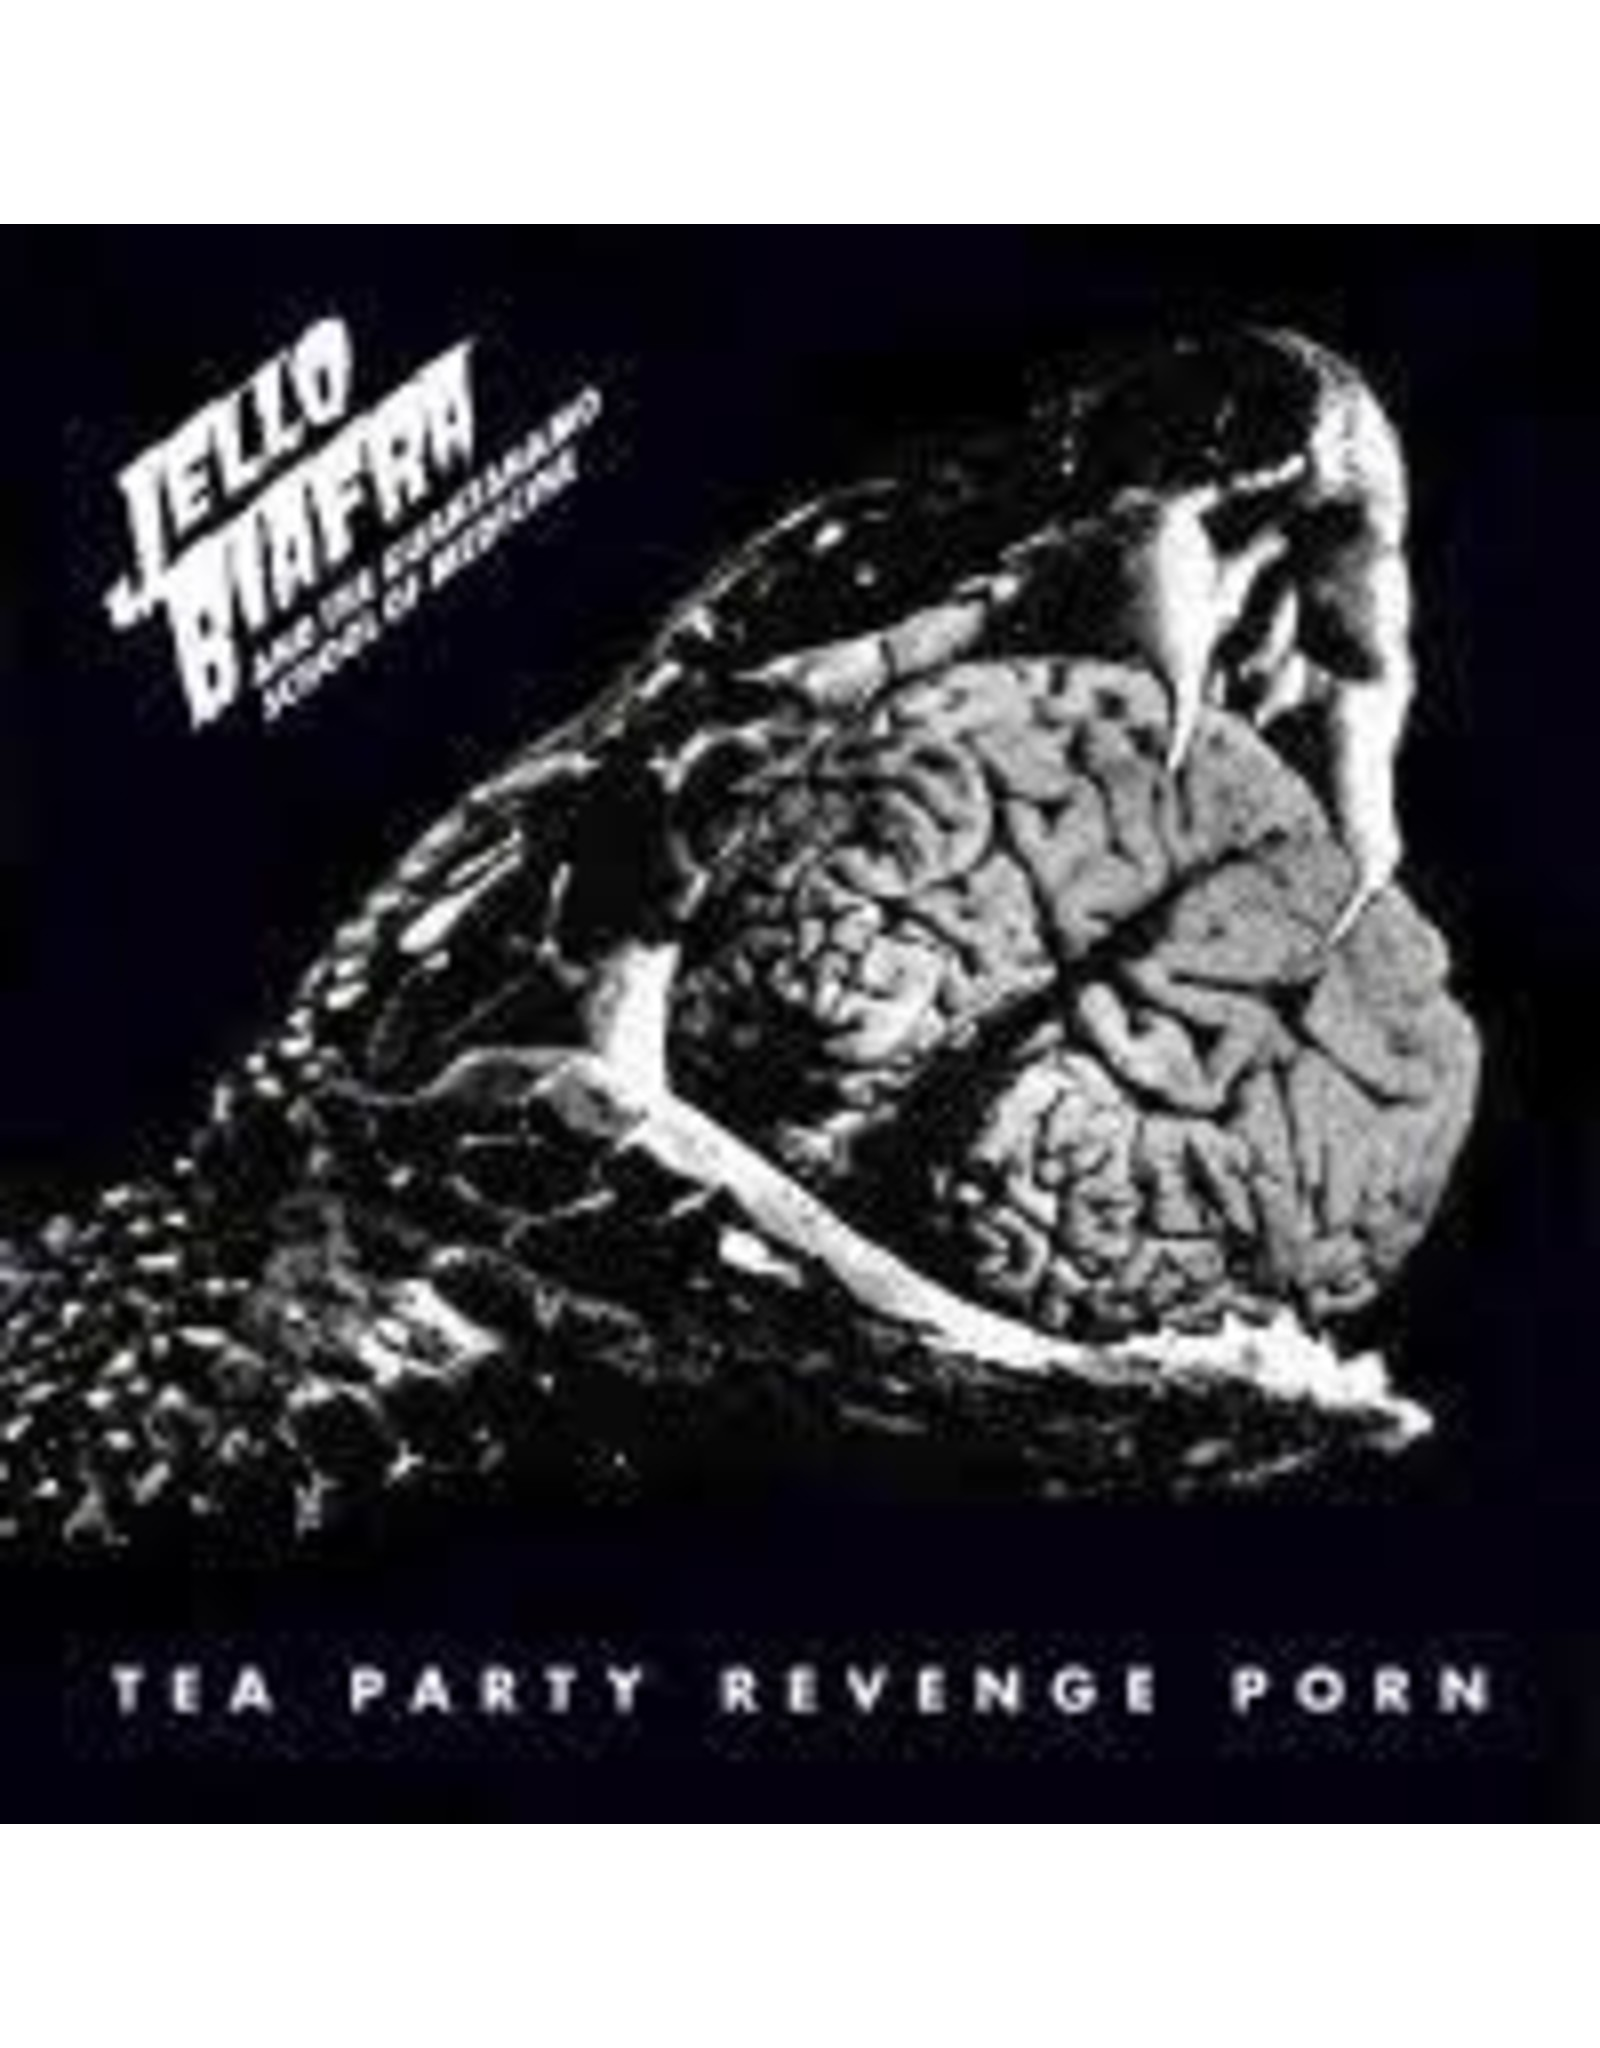 Biafra, Jello - Tea Party Revenge Porn LP